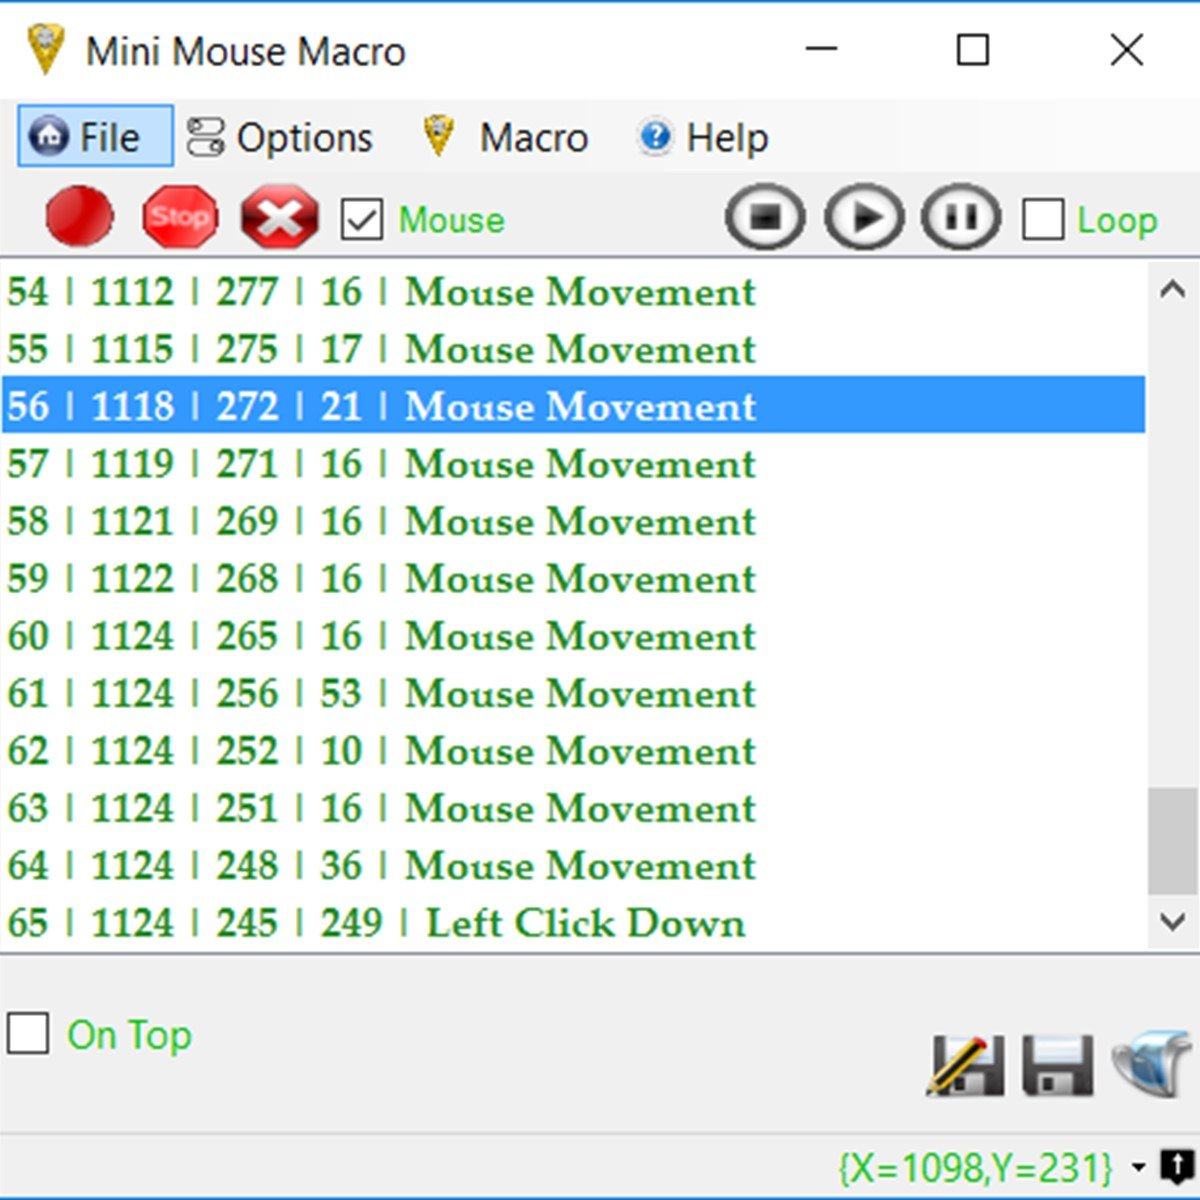 Mini Mouse Macro Alternatives and Similar Software